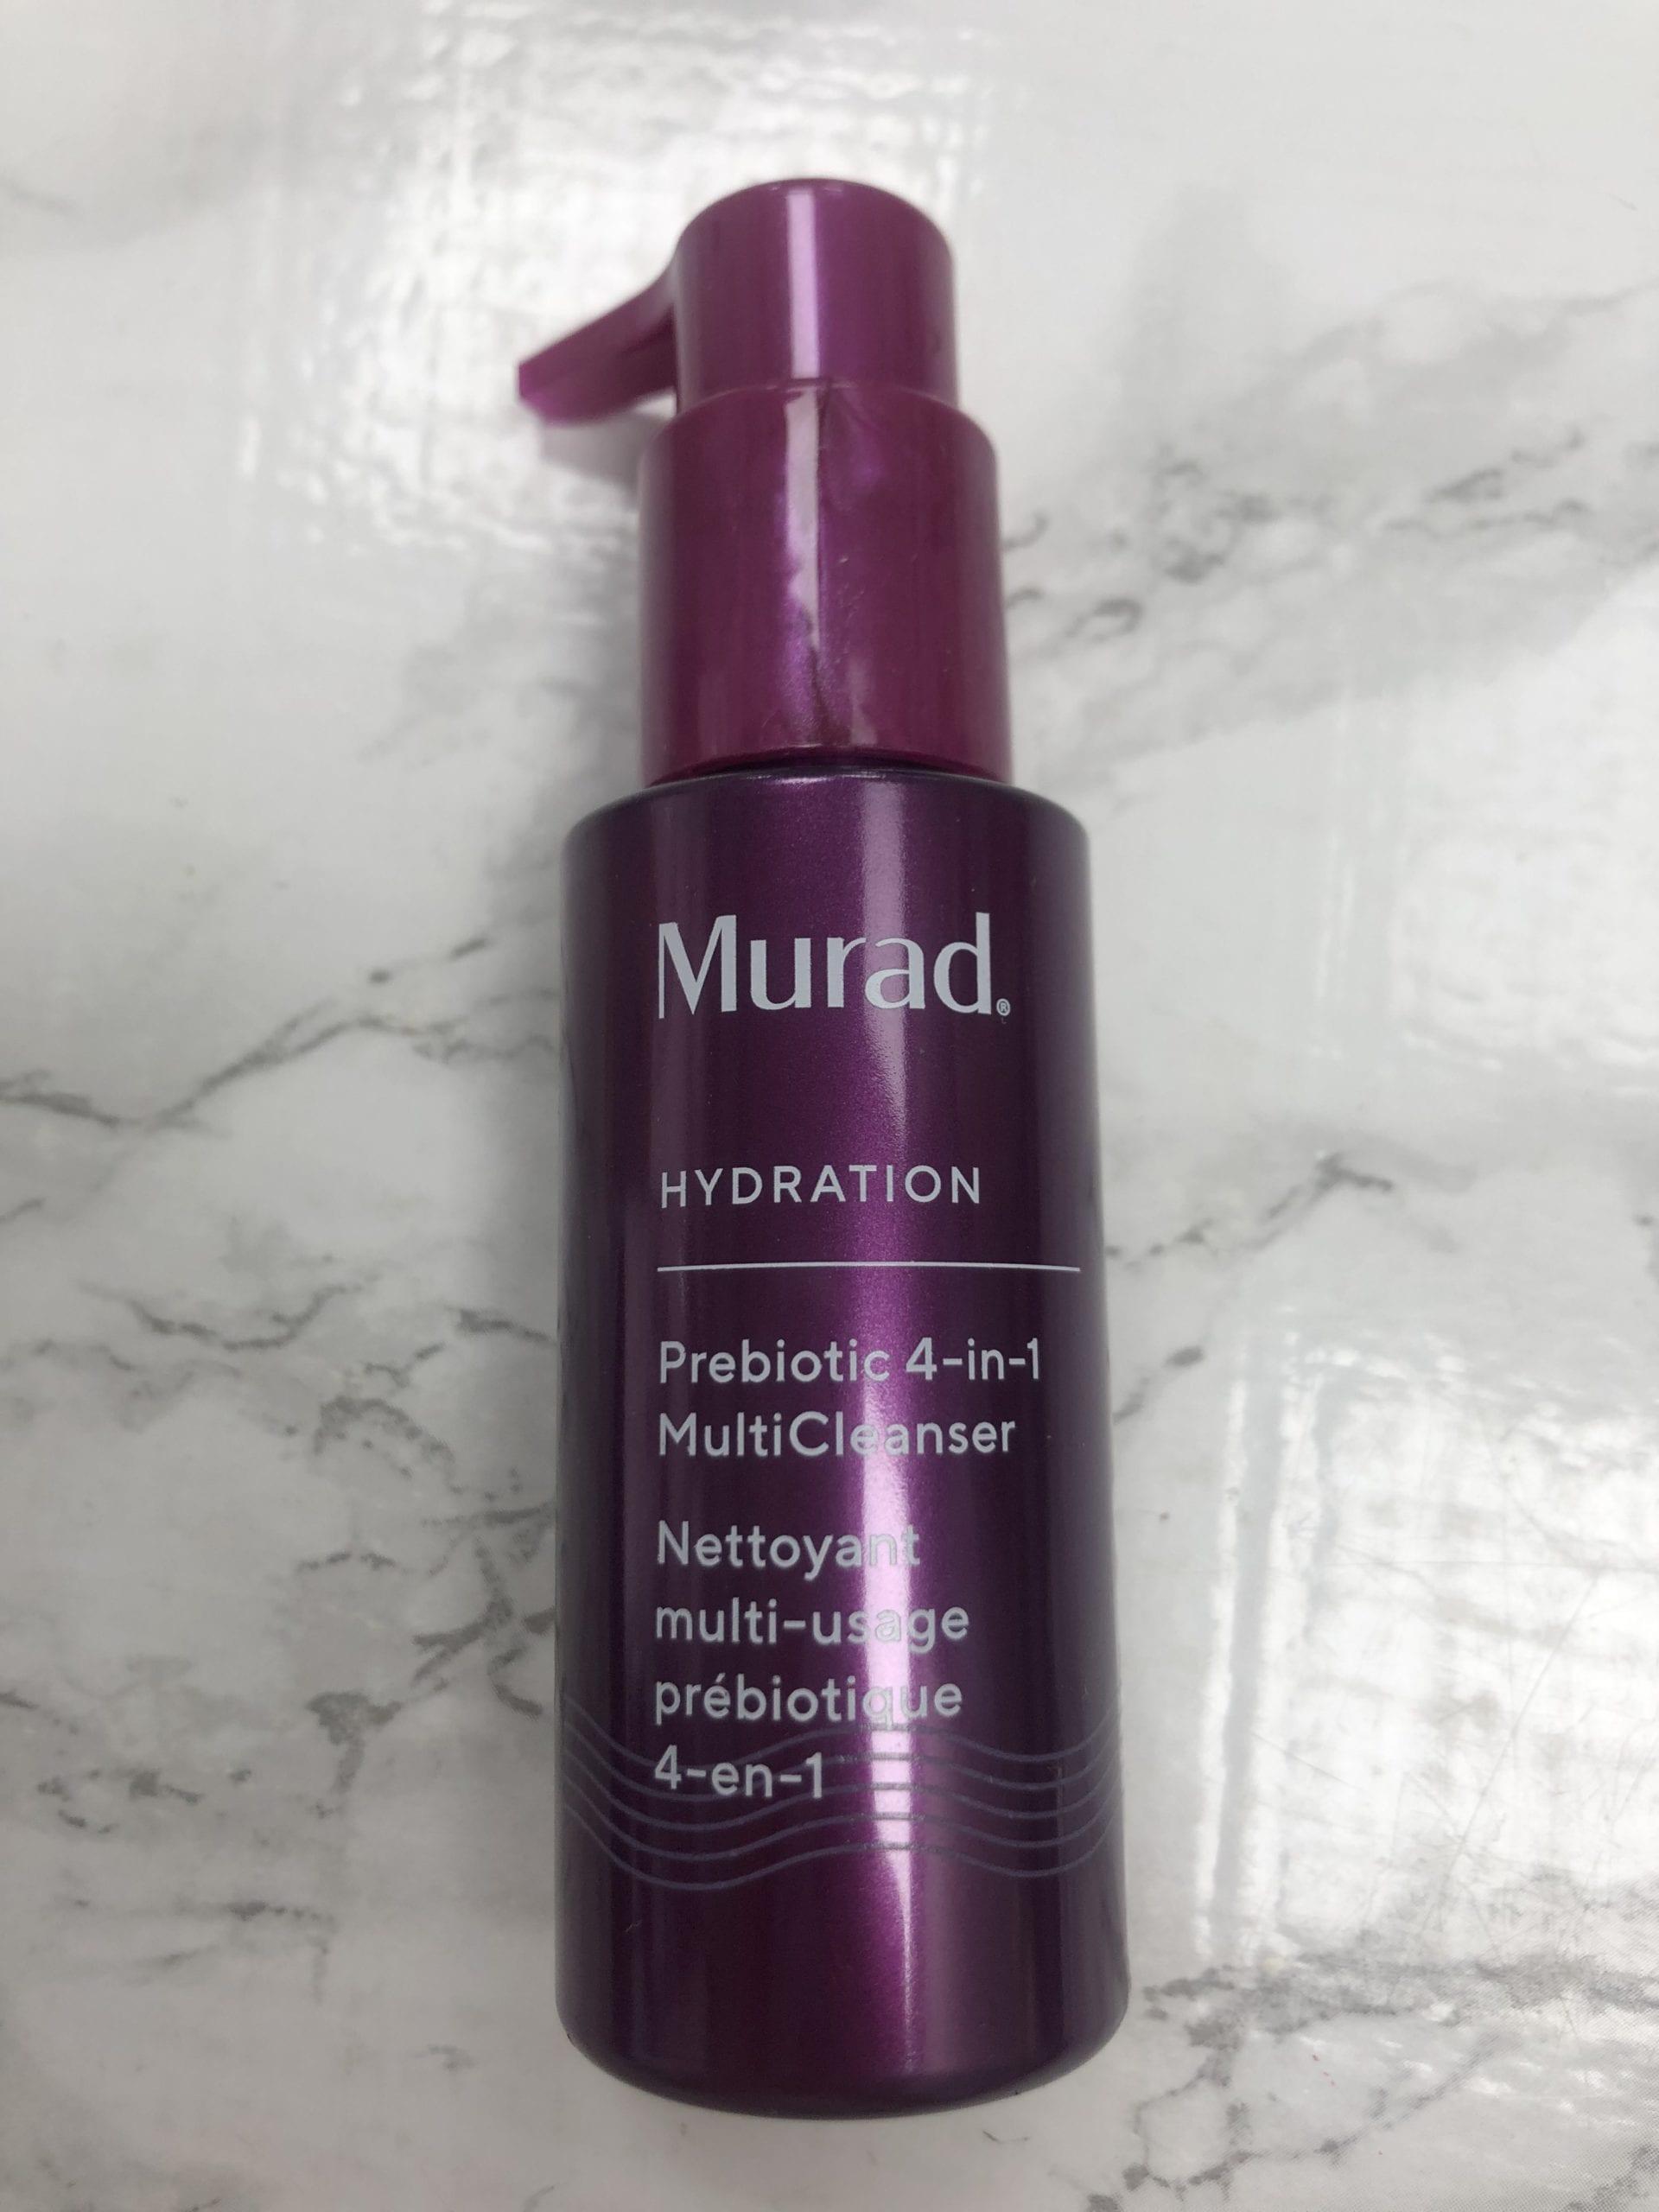 Murad Prebiotic 4-in-1 Multicleanser 50ml (travel size)